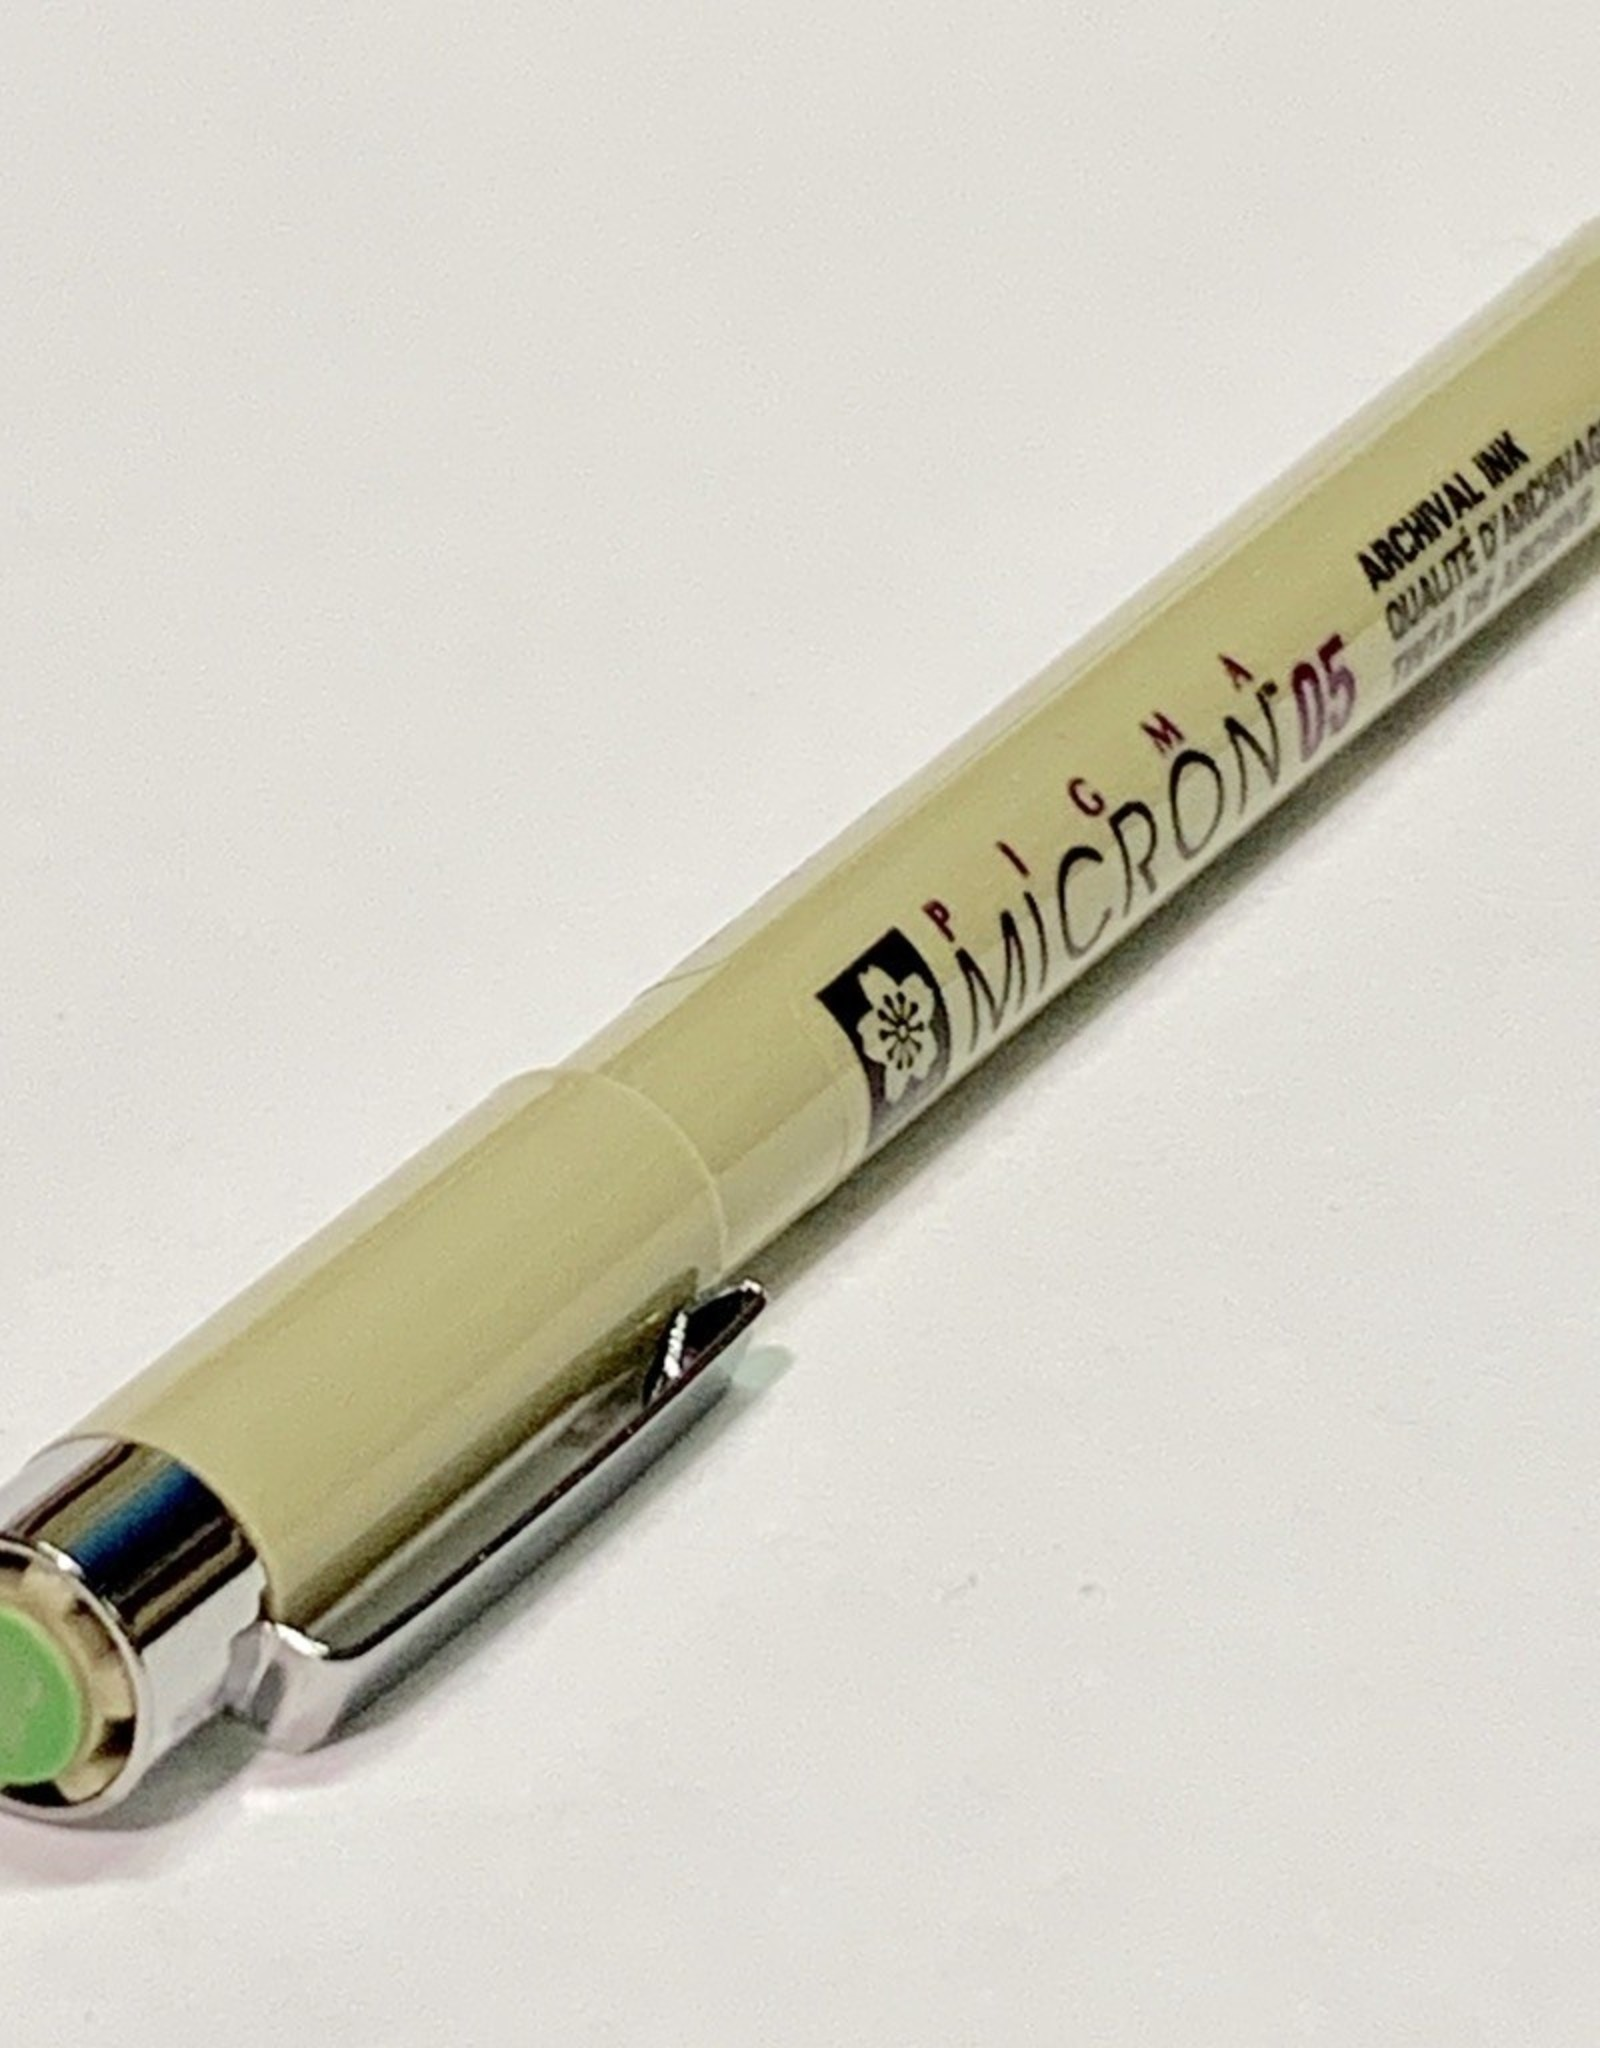 Sakura Micron Lime Green Pen 05 .45mm